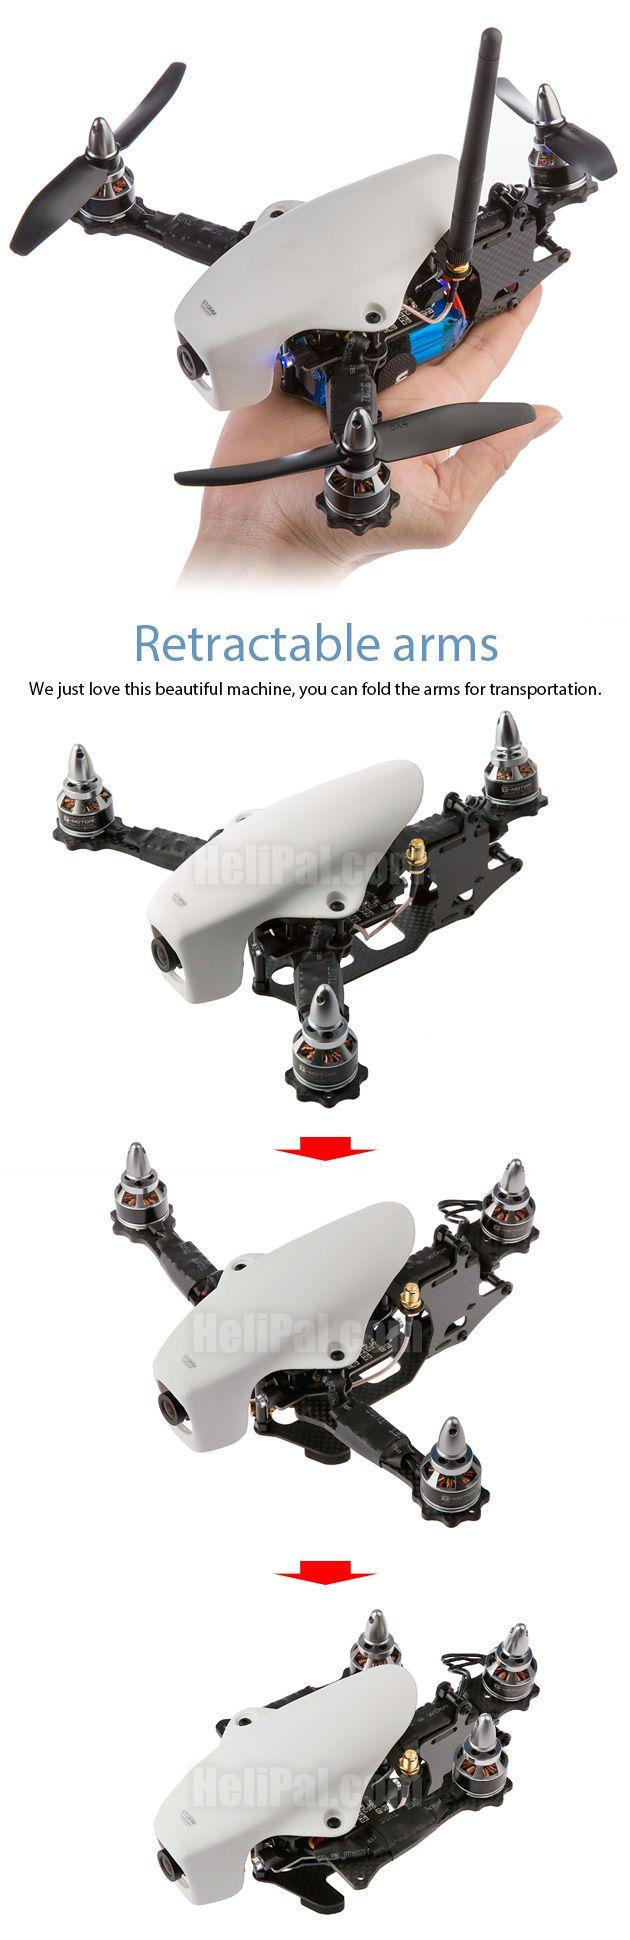 Storm Racing Drone (RTF / SRD-Y3 / CC3D) http://www.helipal.com/storm-racing-drone-rtf-srd-y3-cc3d.html